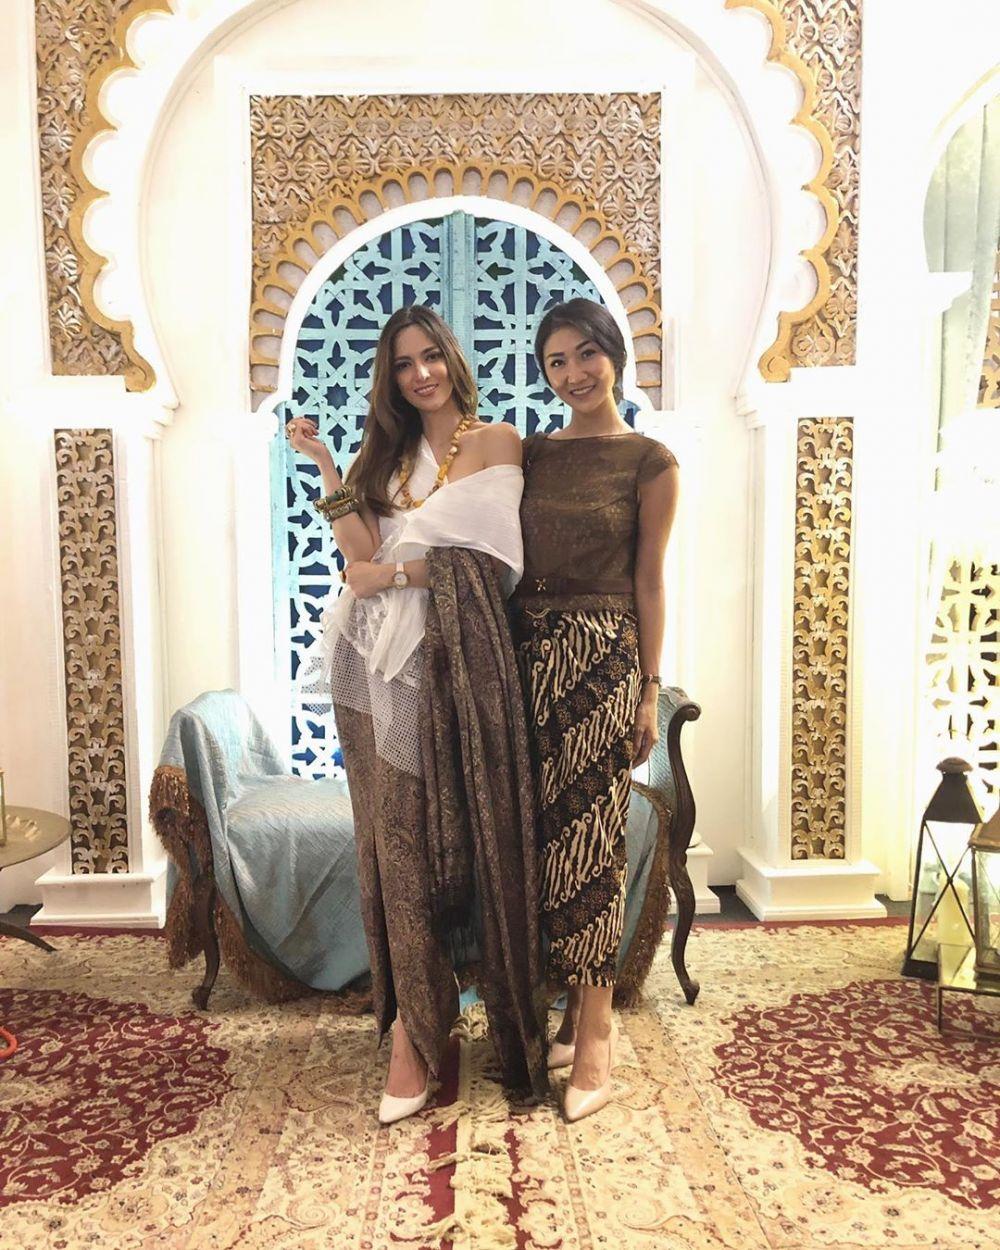 Theresa dan Nia Ramadhani  Instagram